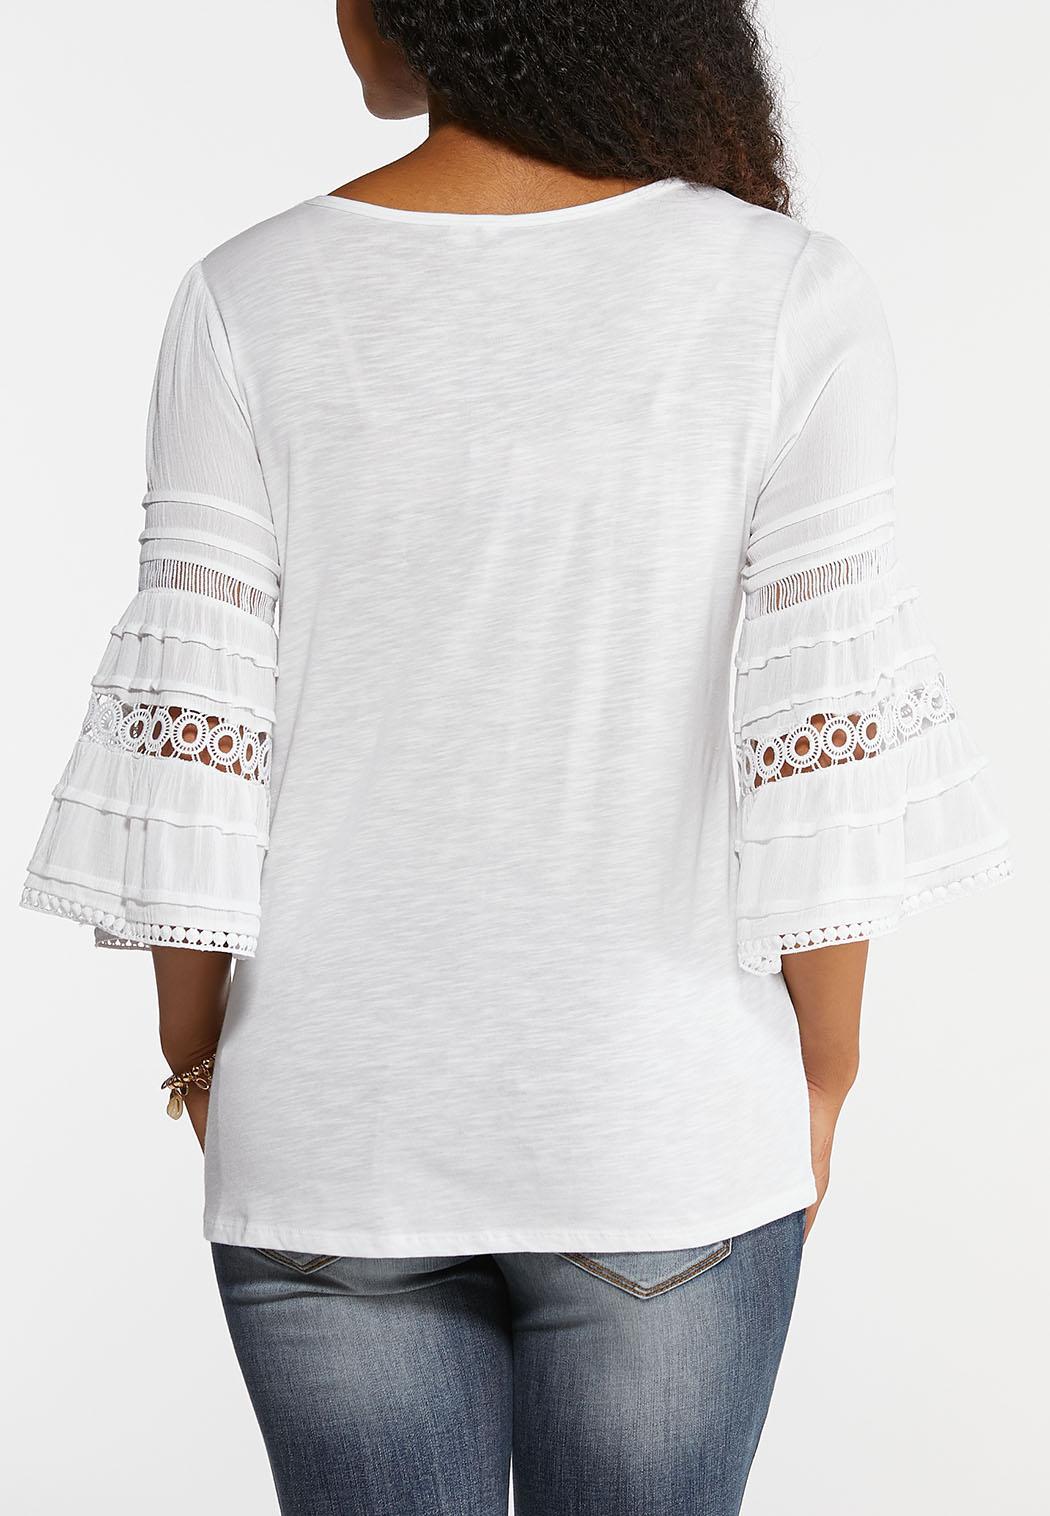 Plus Size Crochet Bell Sleeve Tee (Item #43948992)